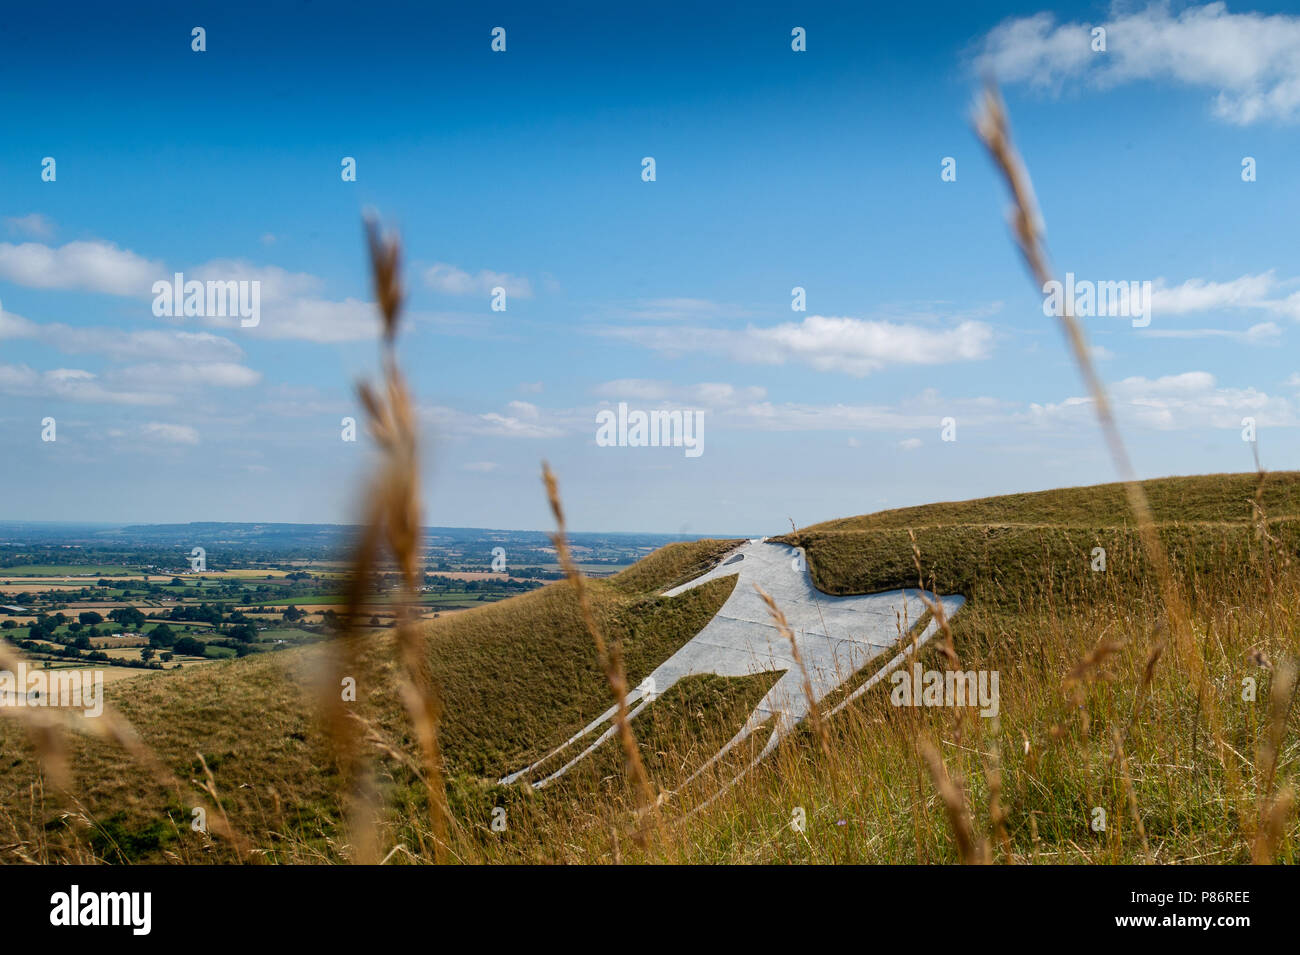 Westbury White Horse during the summer heatwave 2018 Stock Photo